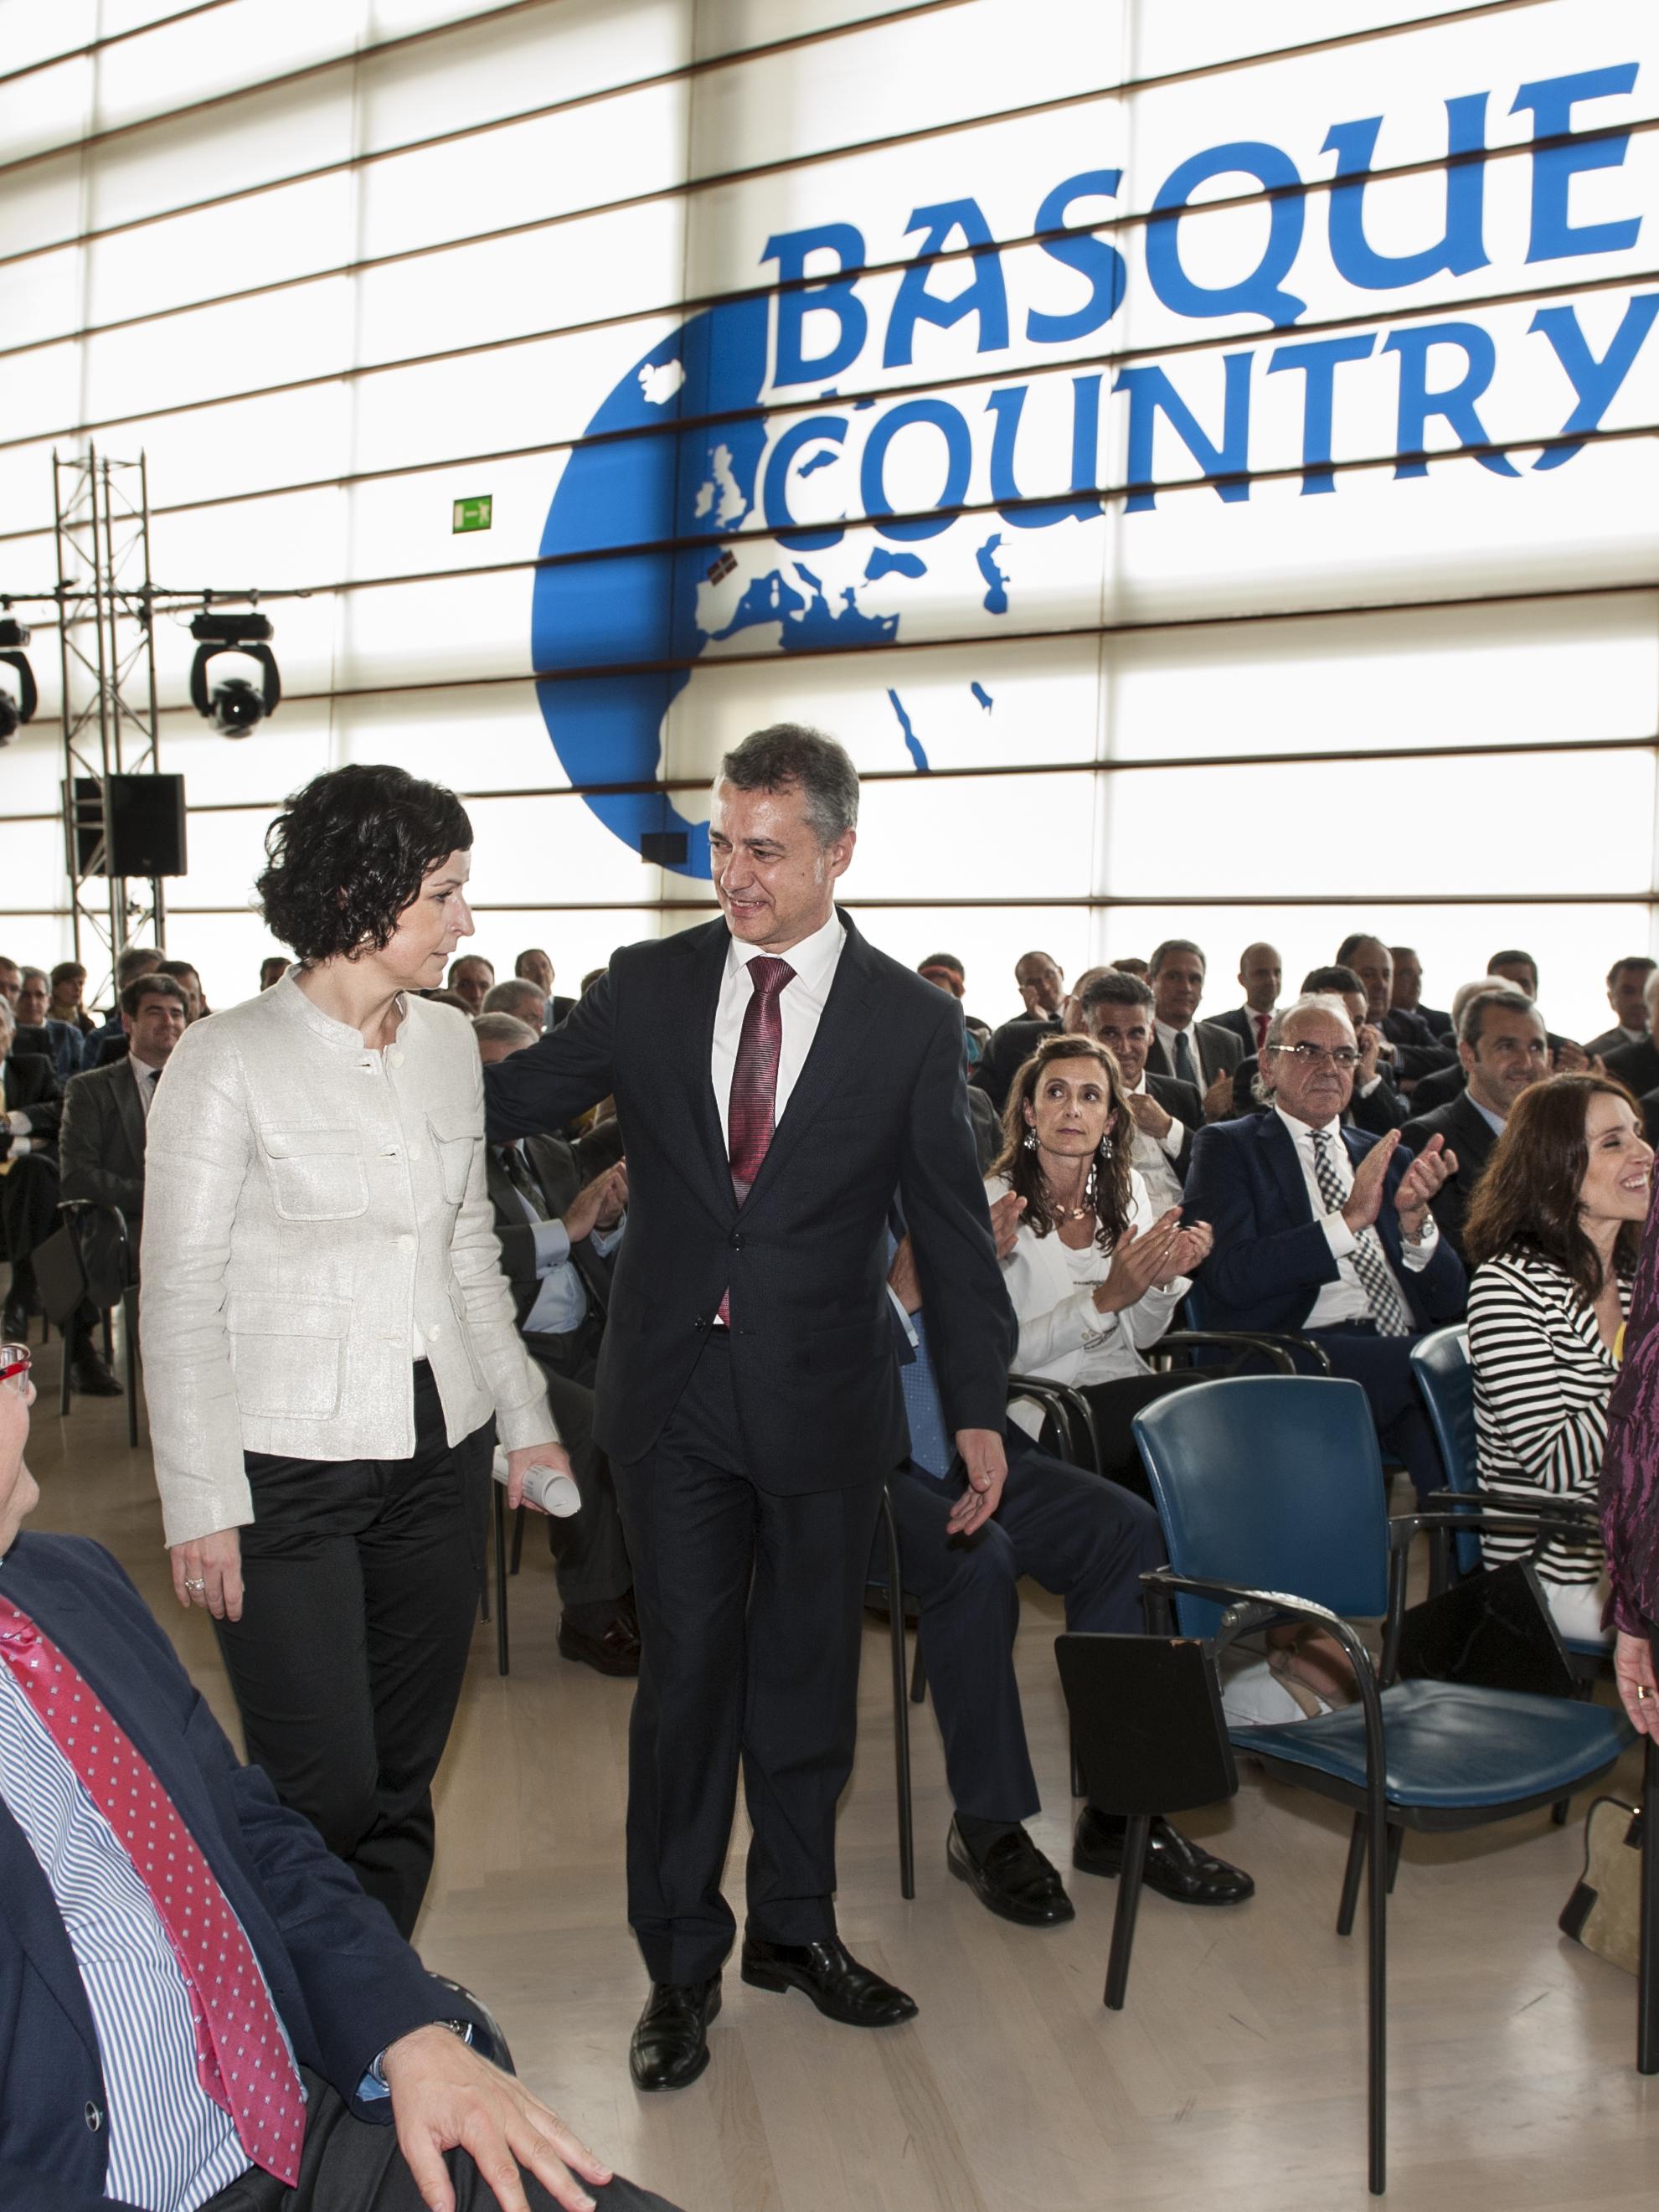 2013_06_25_lehen_basque_country_049.jpg